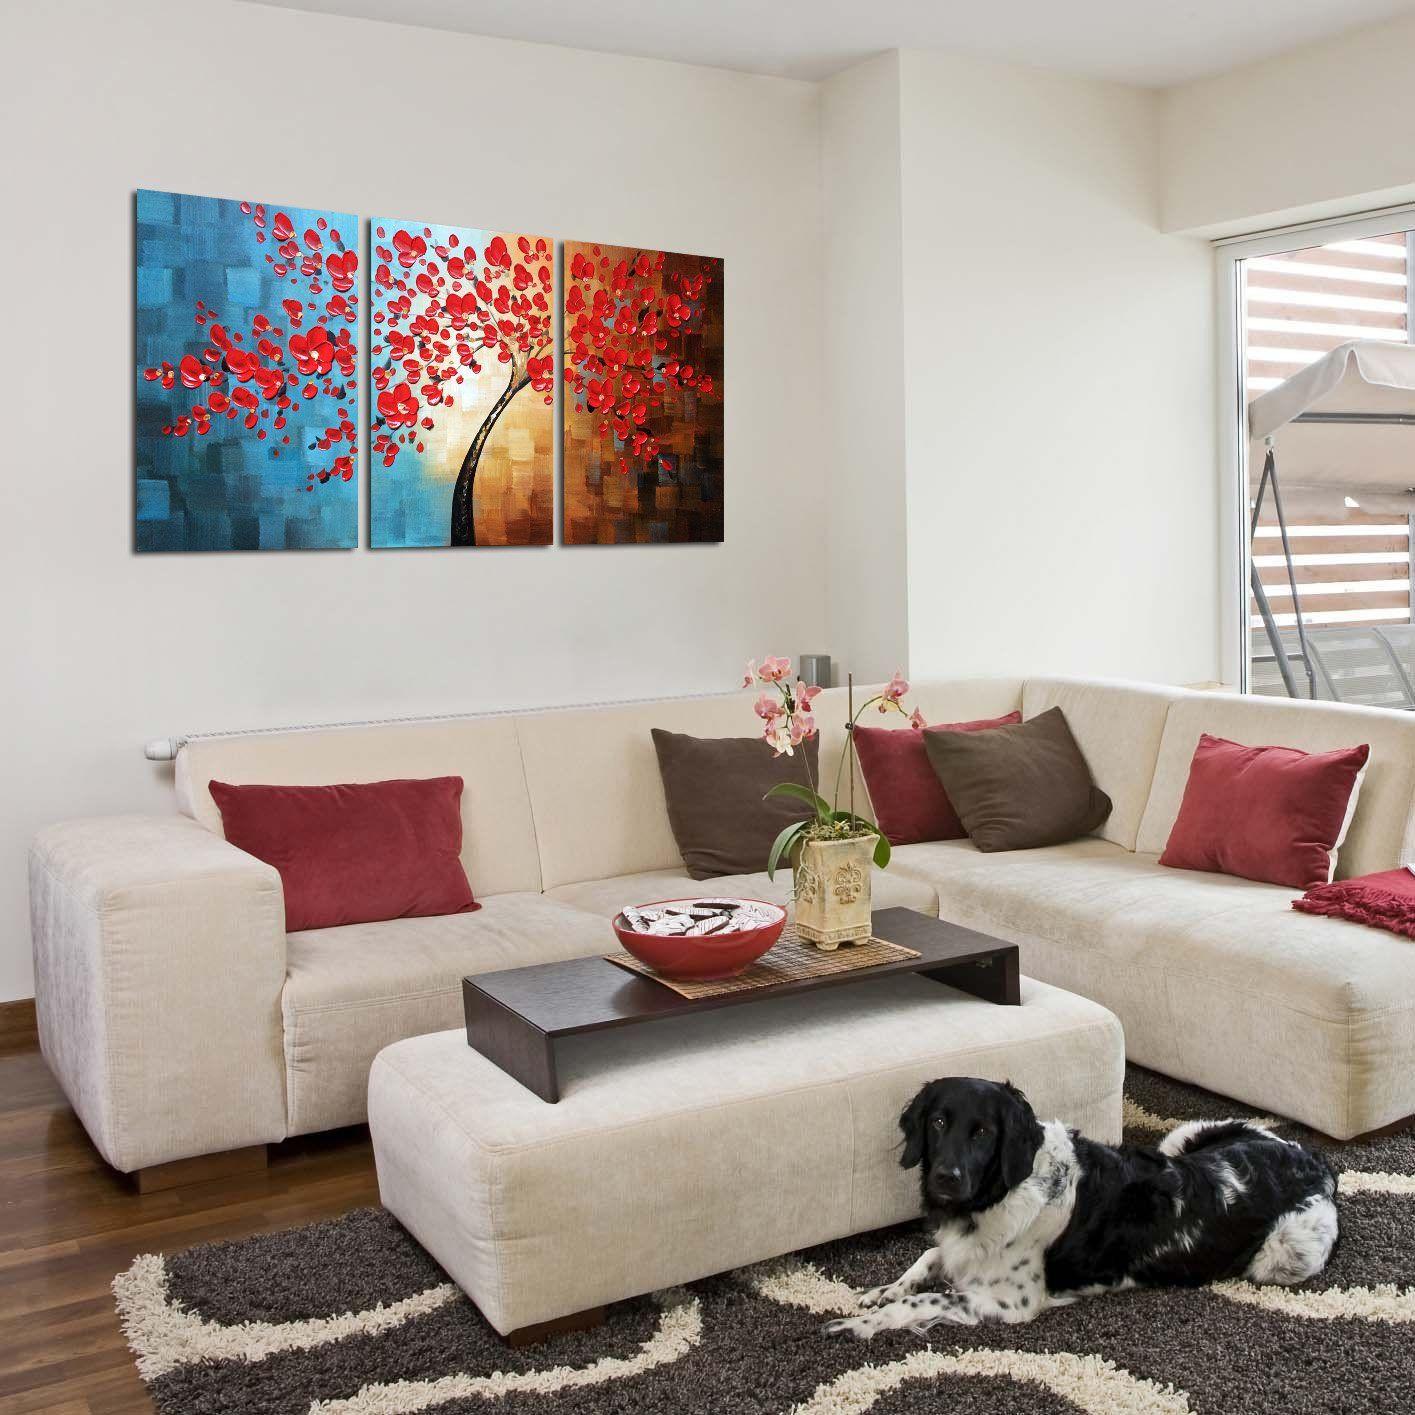 Winpeak Art Handpainted Abstract Oil Painting Modern Plum